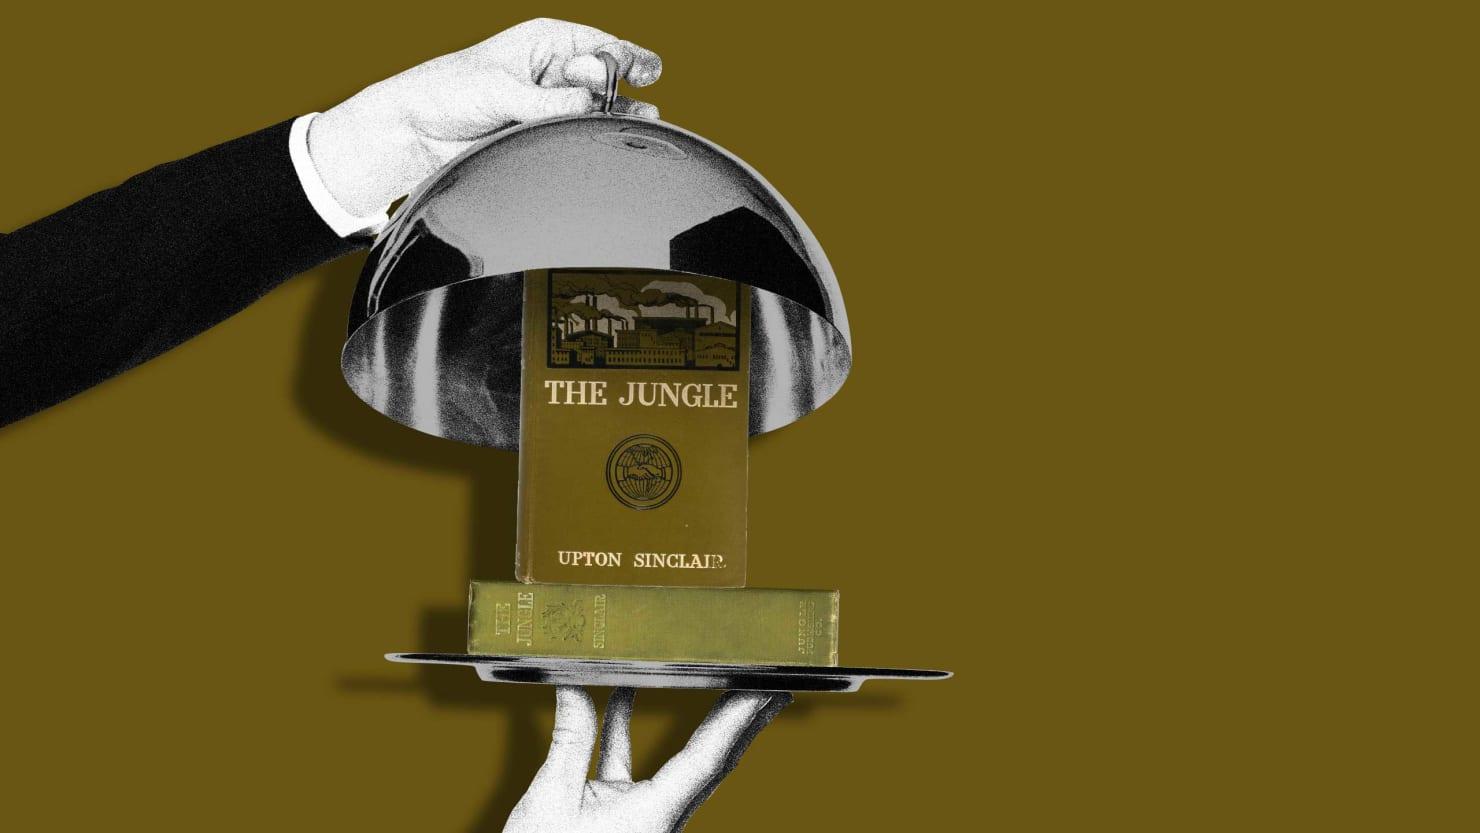 waiter opening silverware plate to reveal upton sinclair the jungle deborah blum poison squad